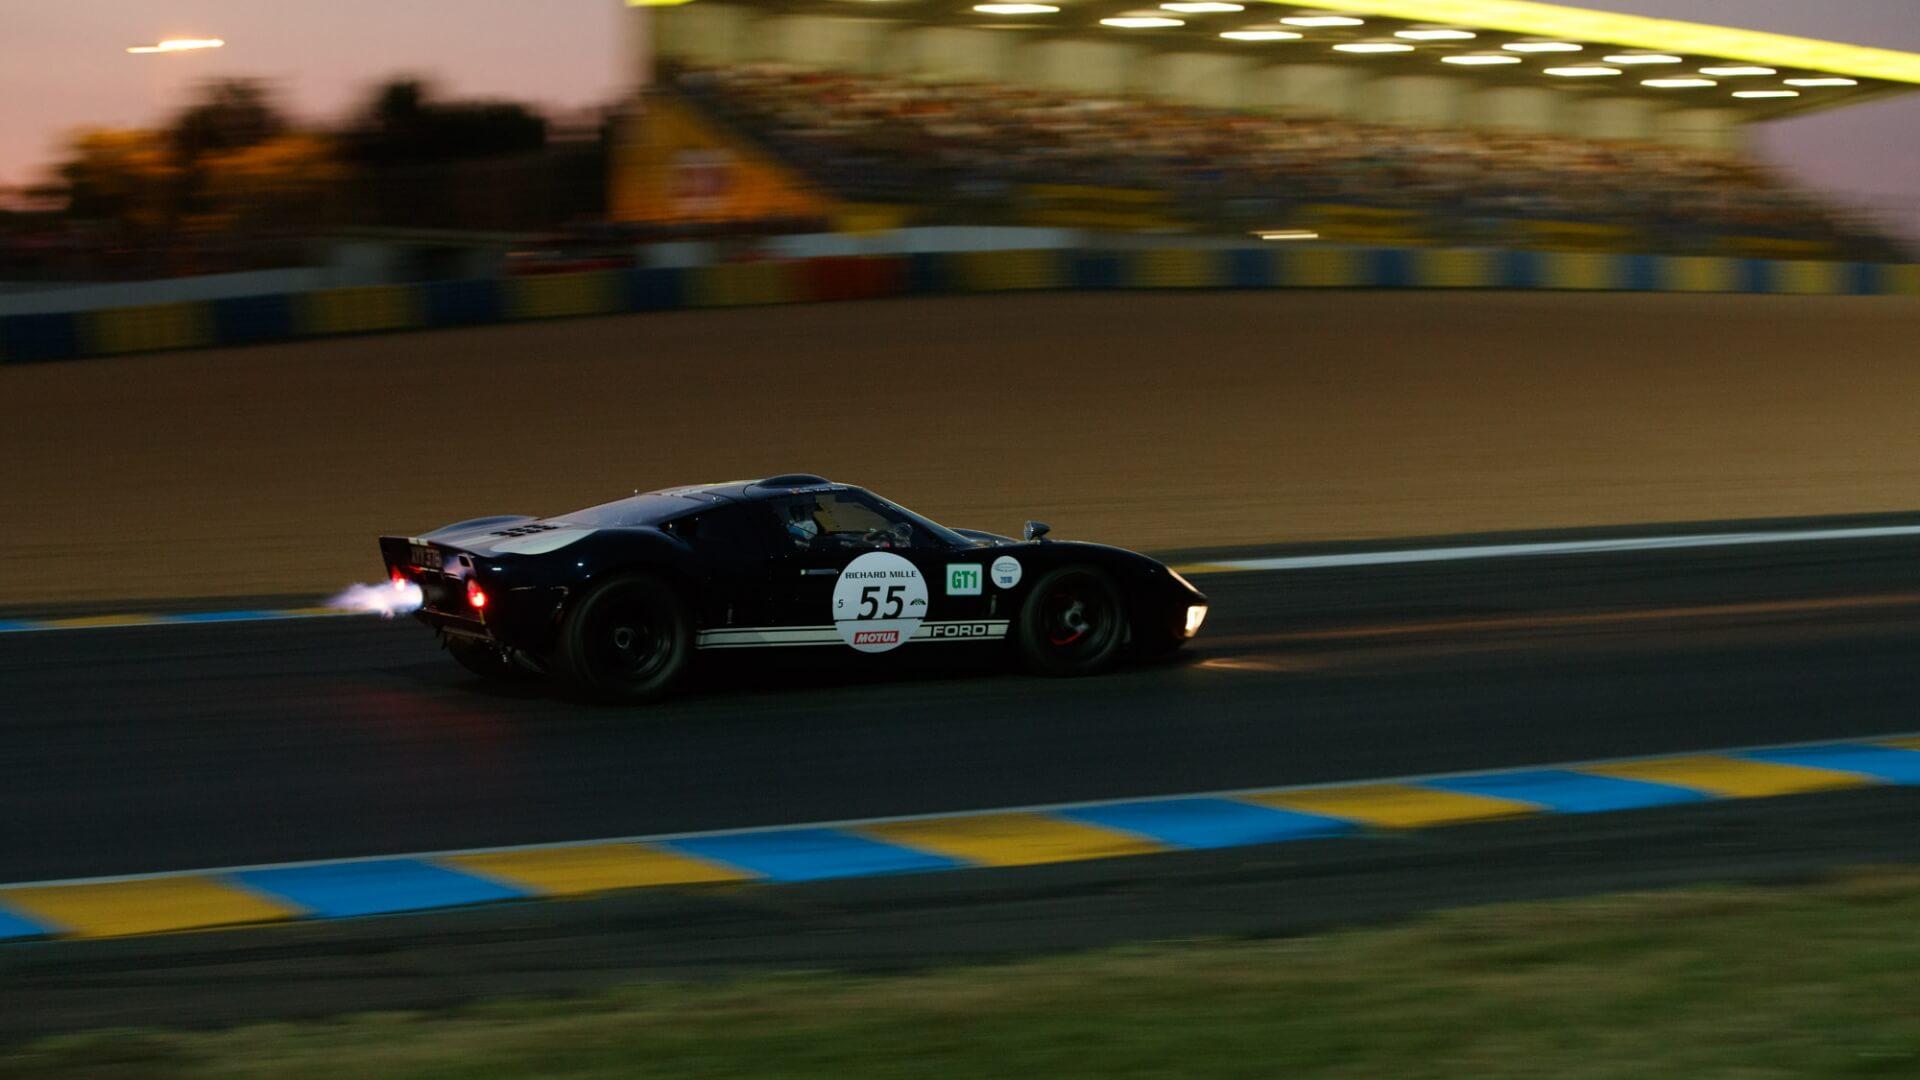 Le Mans Classic: Strong showing for Gipimotor at Circuit de la Sarthe · Gipimotor